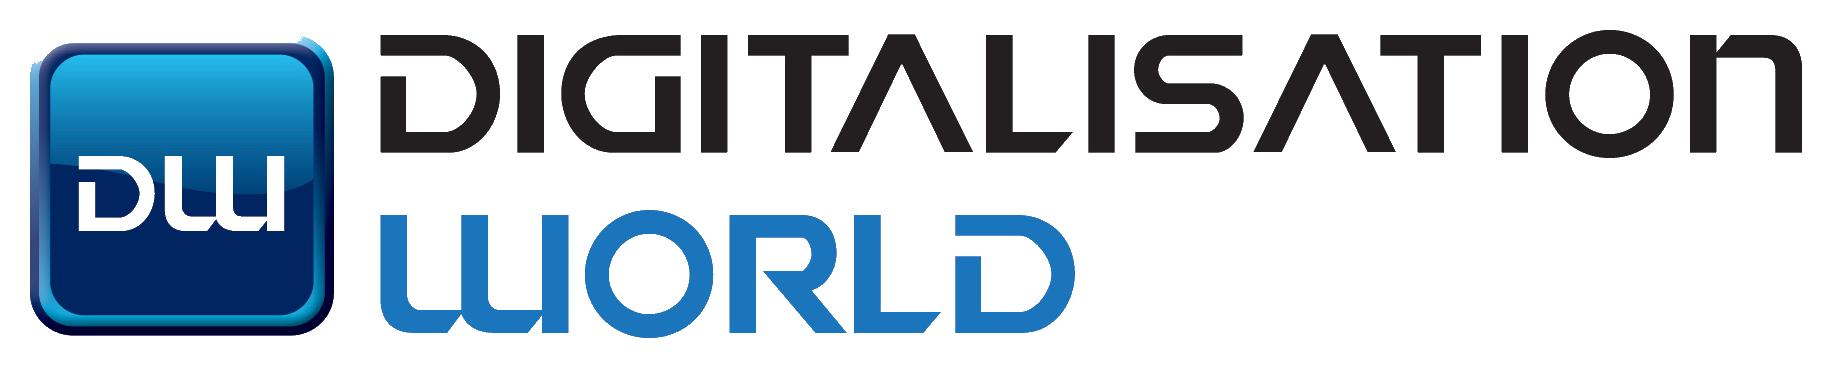 digitalisation-world-logo